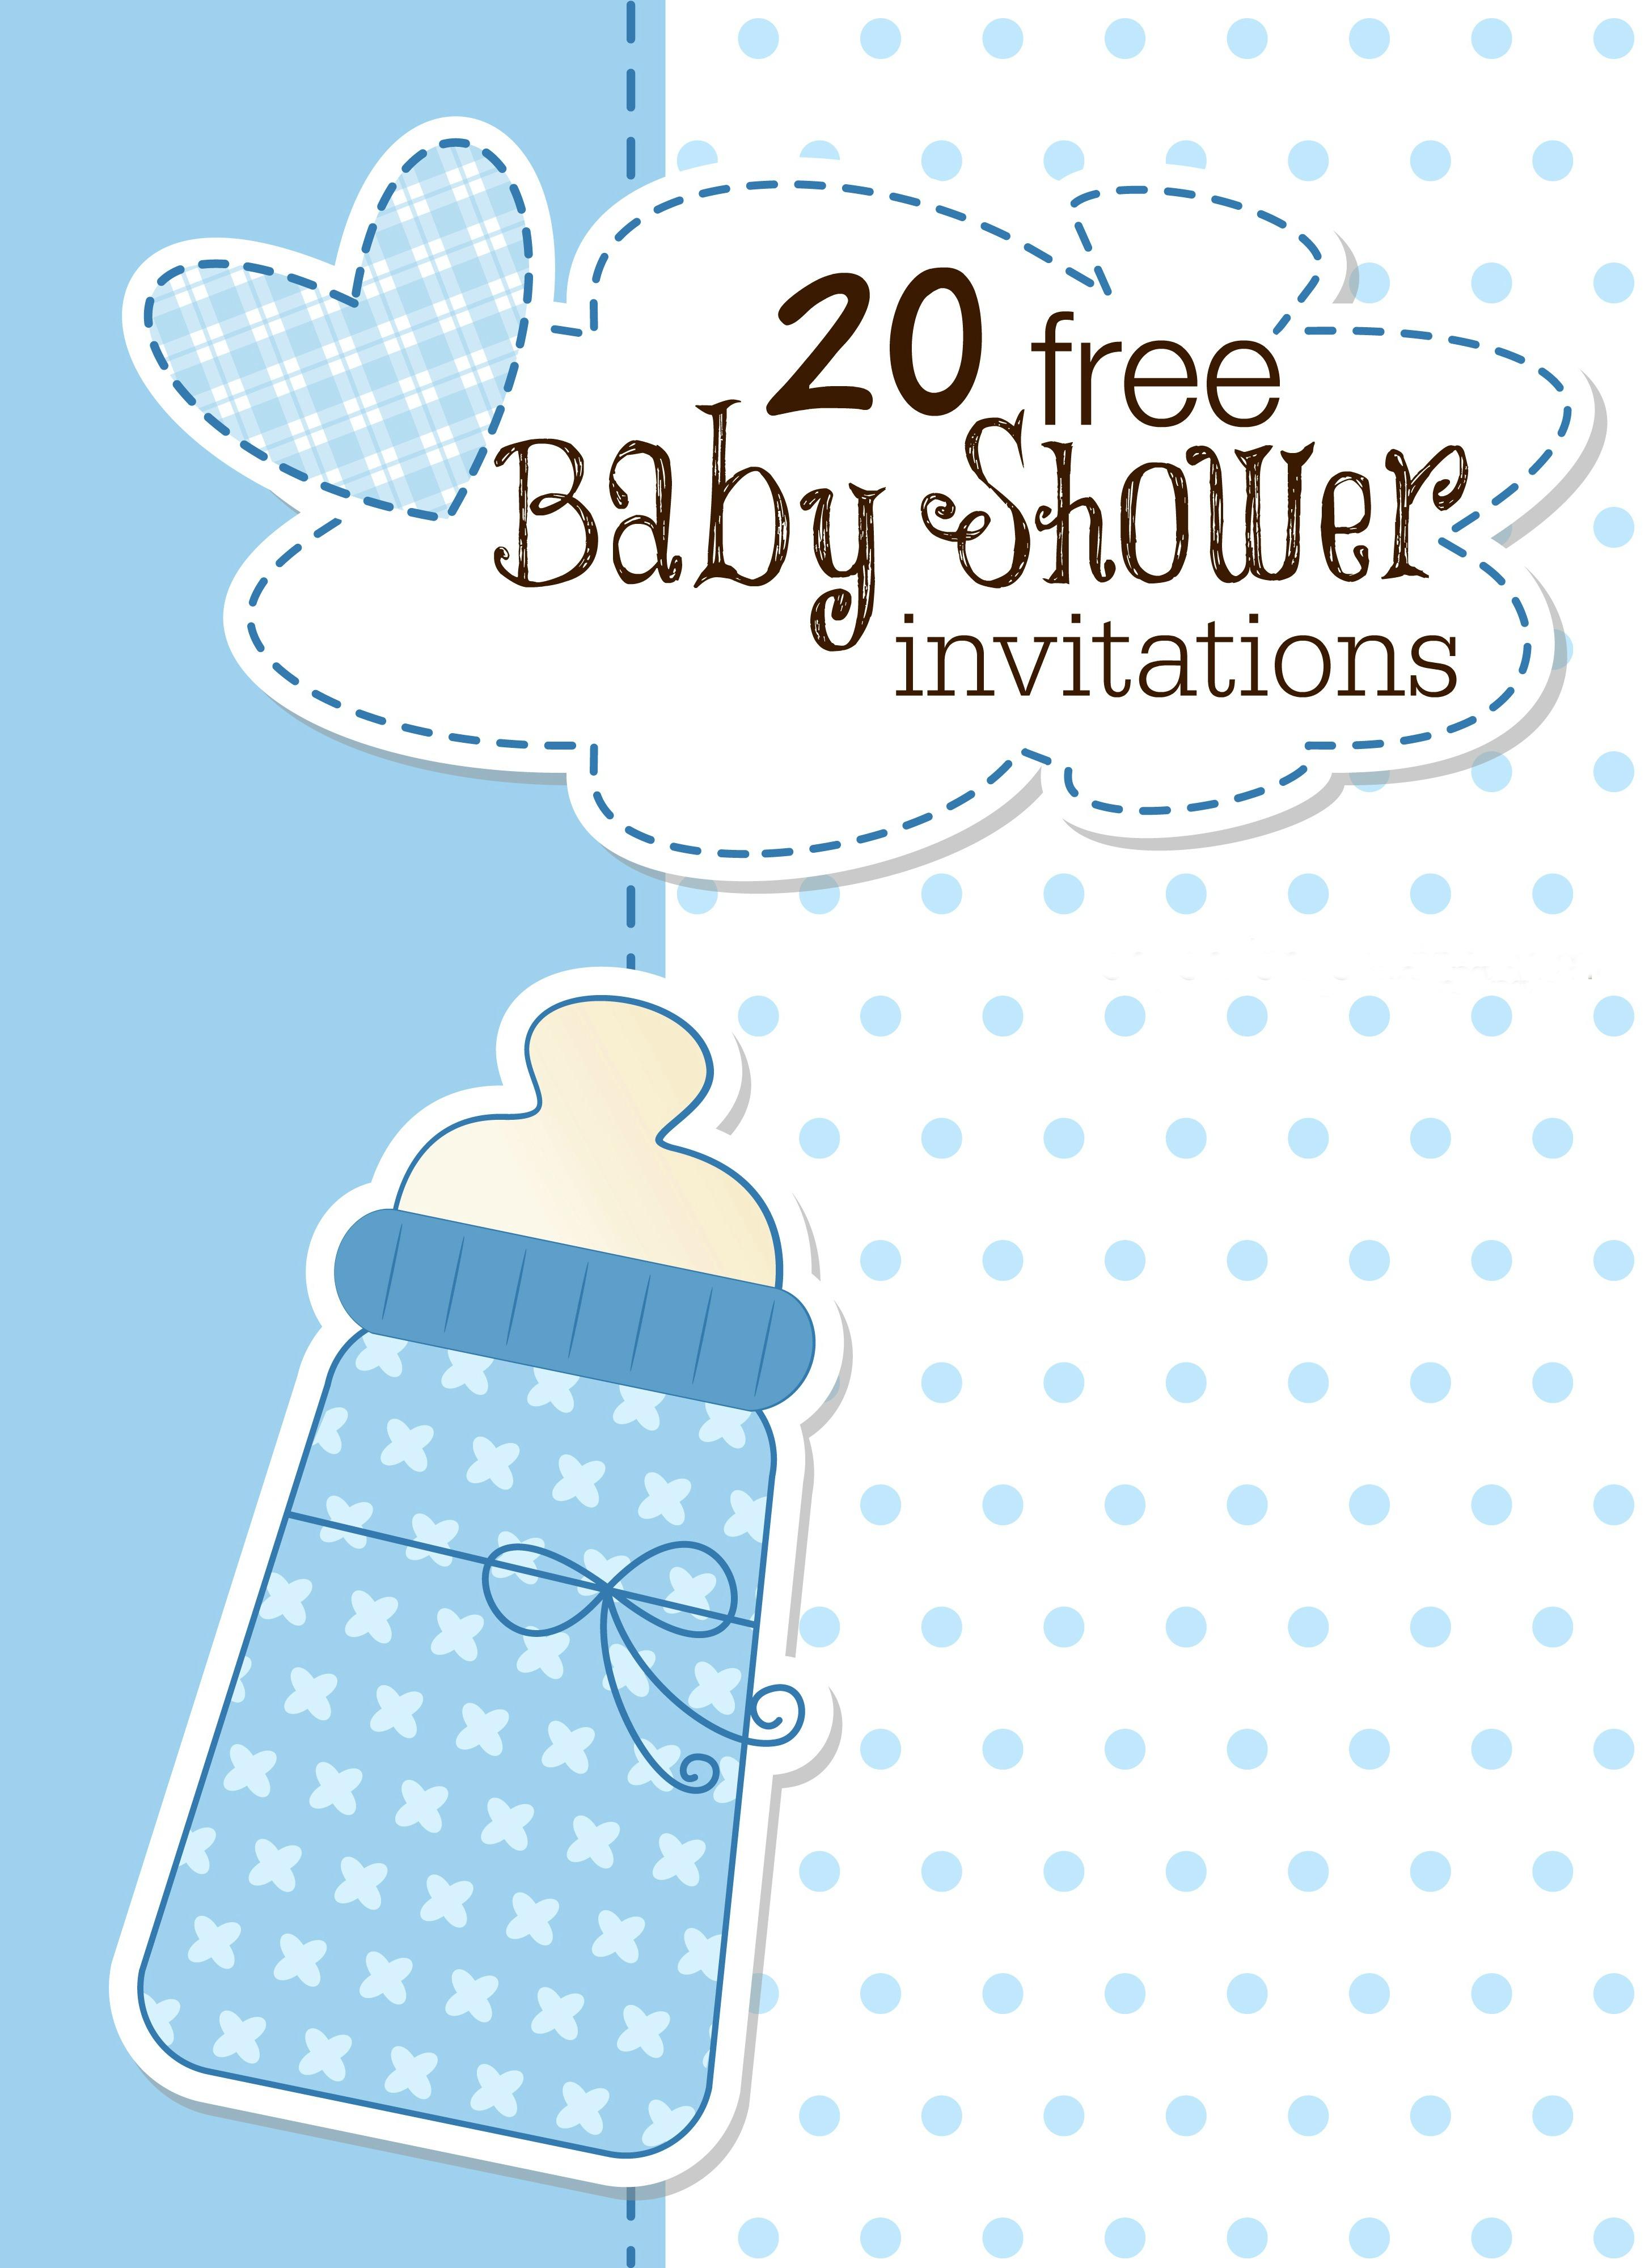 Printable Baby Shower Invitations - Free Printable Twin Baby Shower Invitations